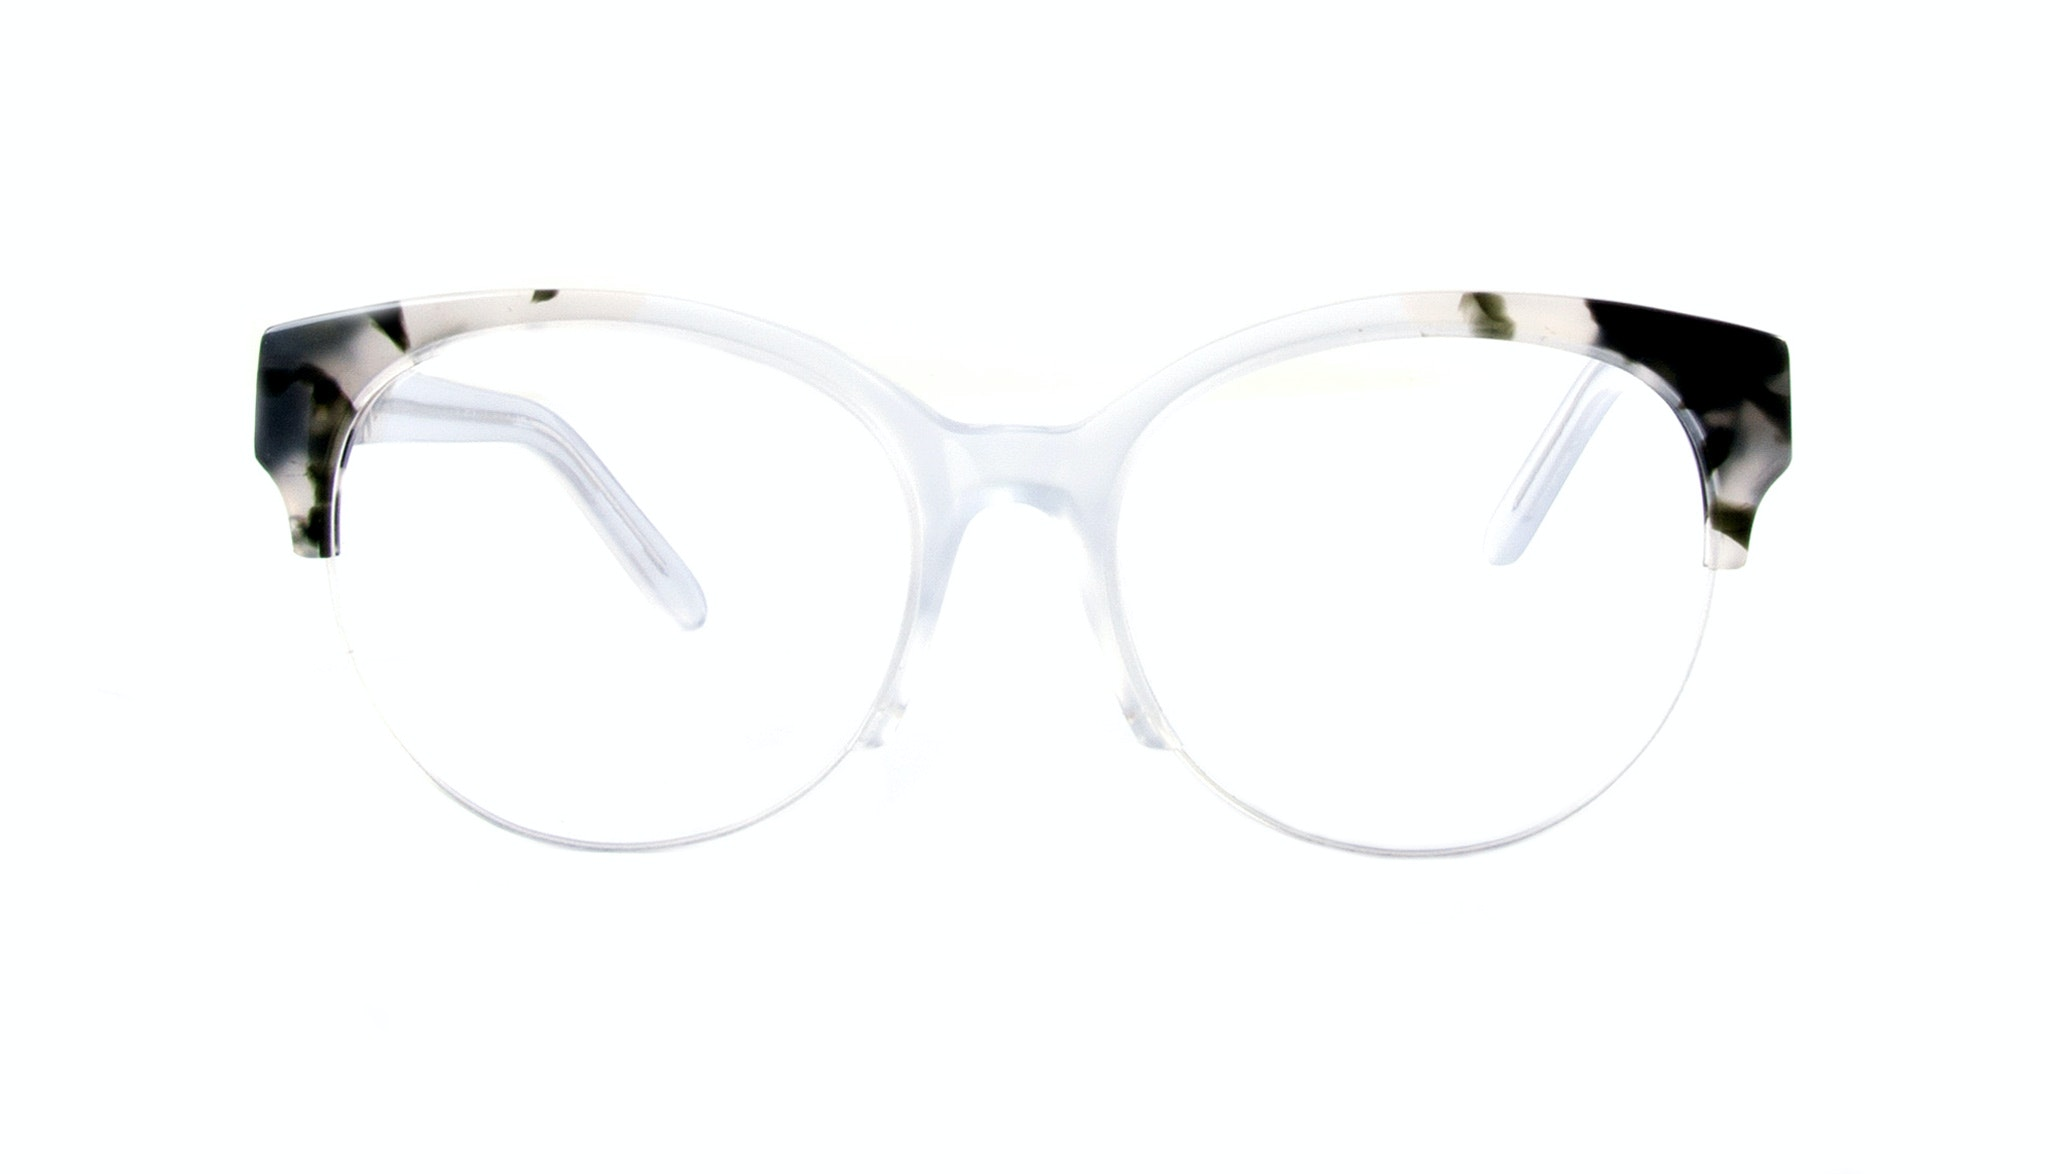 Affordable Fashion Glasses Cat Eye Round Semi-Rimless Eyeglasses Women Eclipse Light Smokey Tort Front